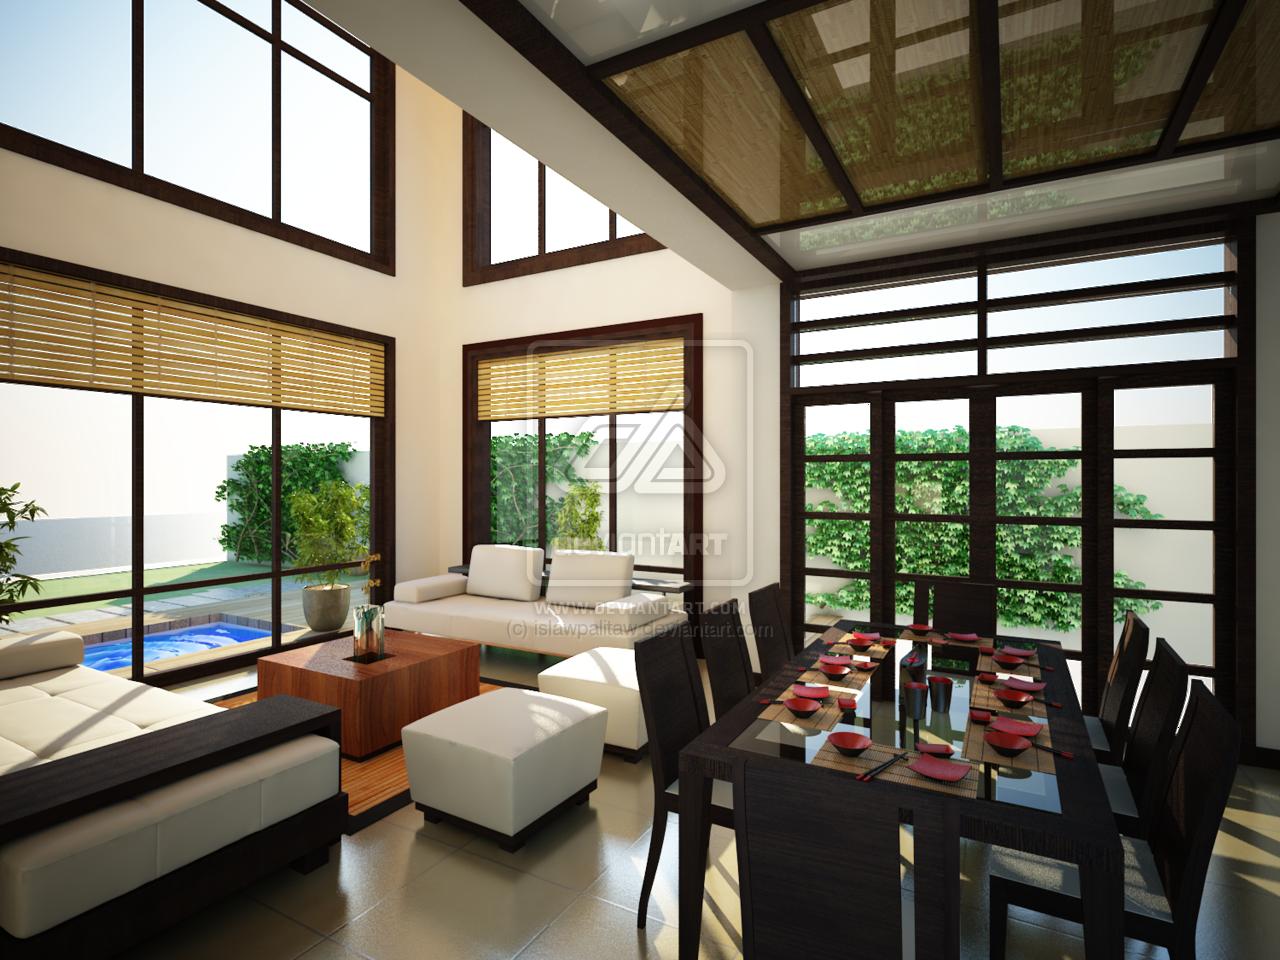 japanese inspired living room furniture arrangement for long narrow by islawpalitaw deviantart com on